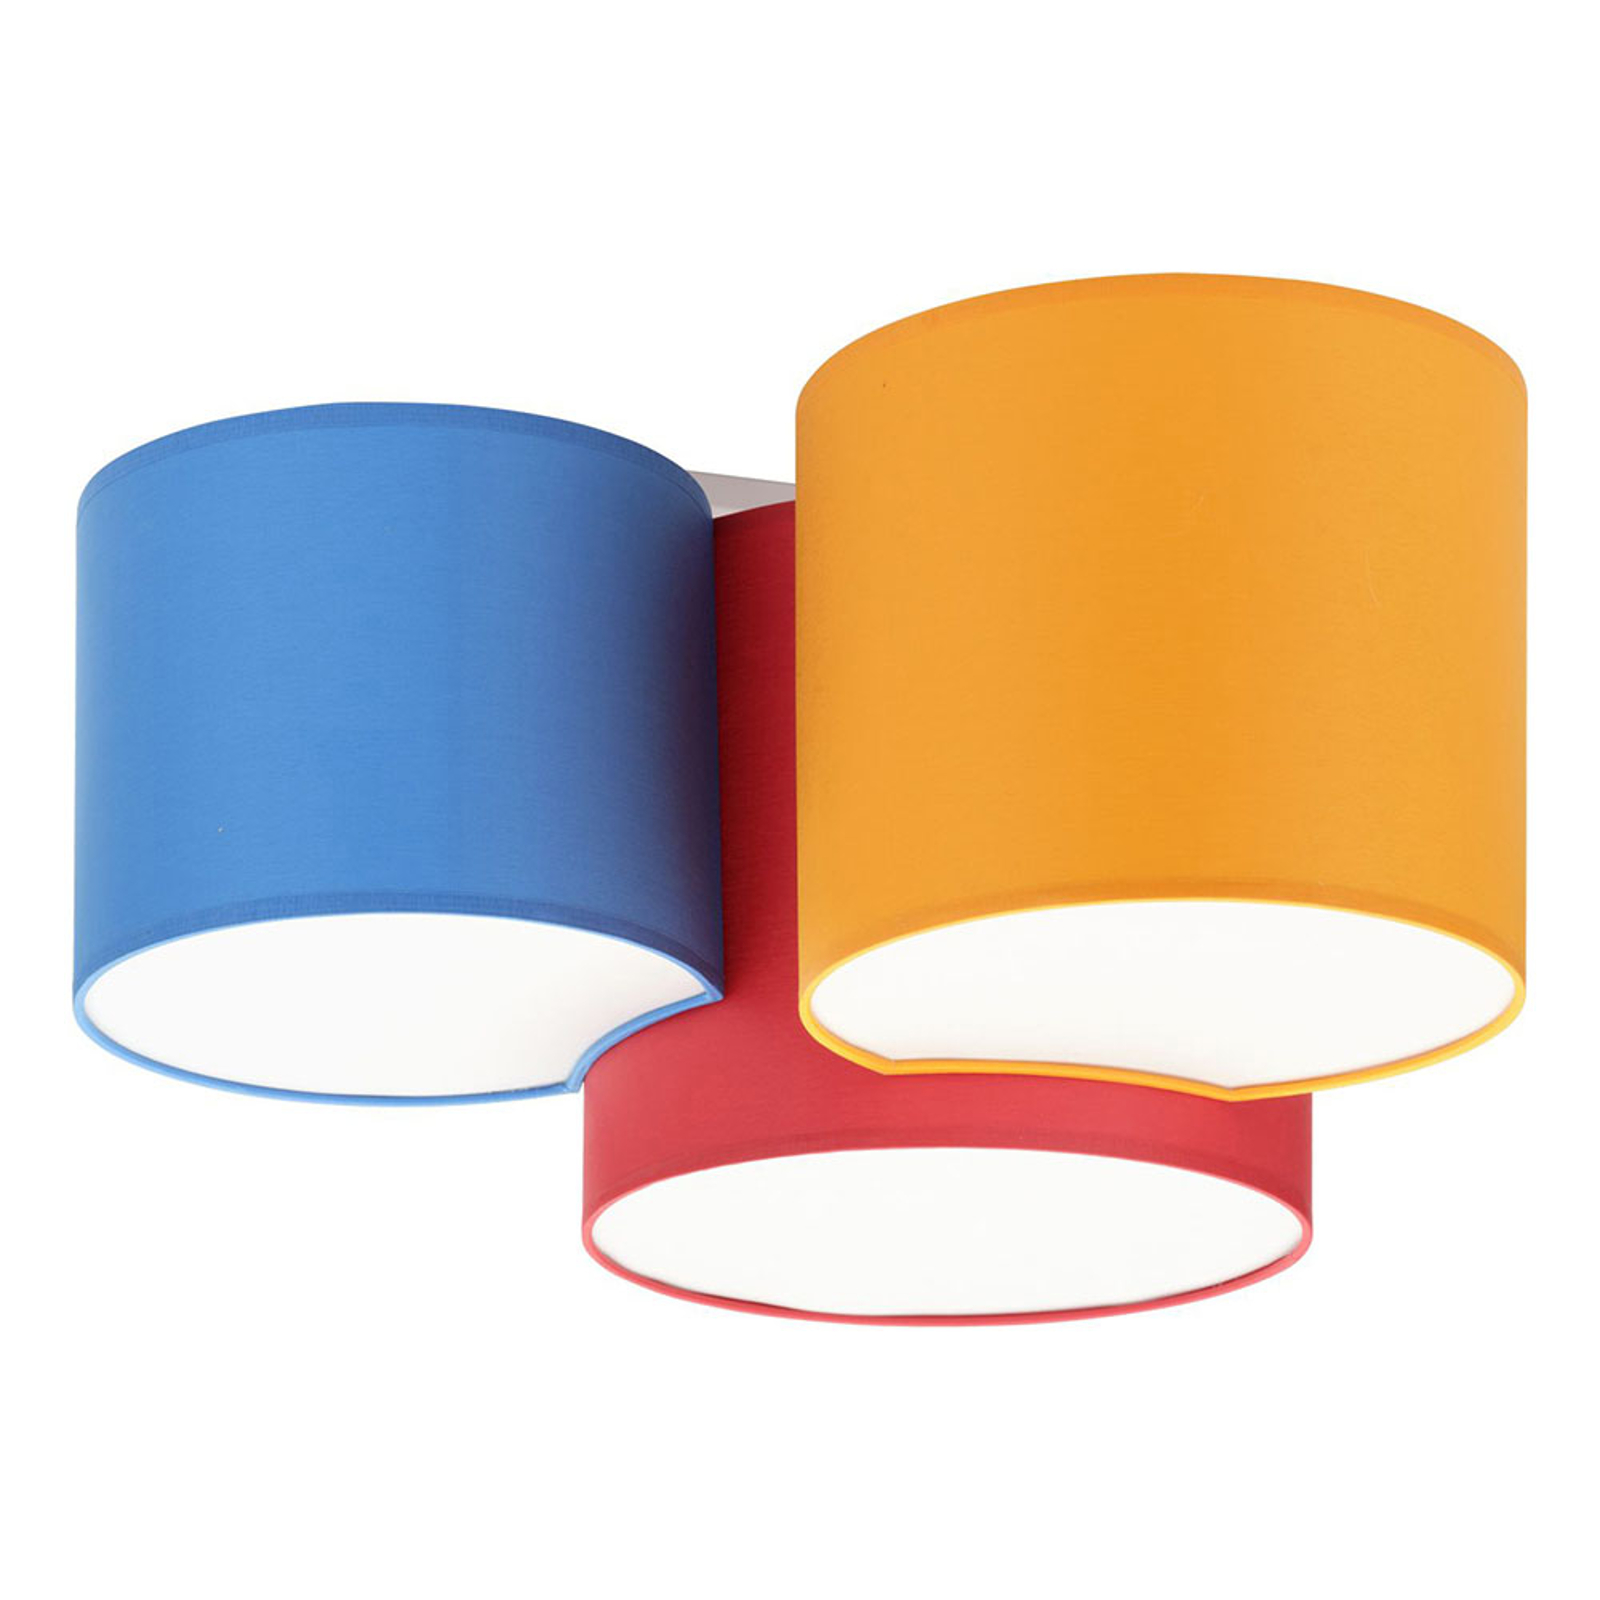 Taklampe Mona, 3 lyskilder, rød/oransje/blå